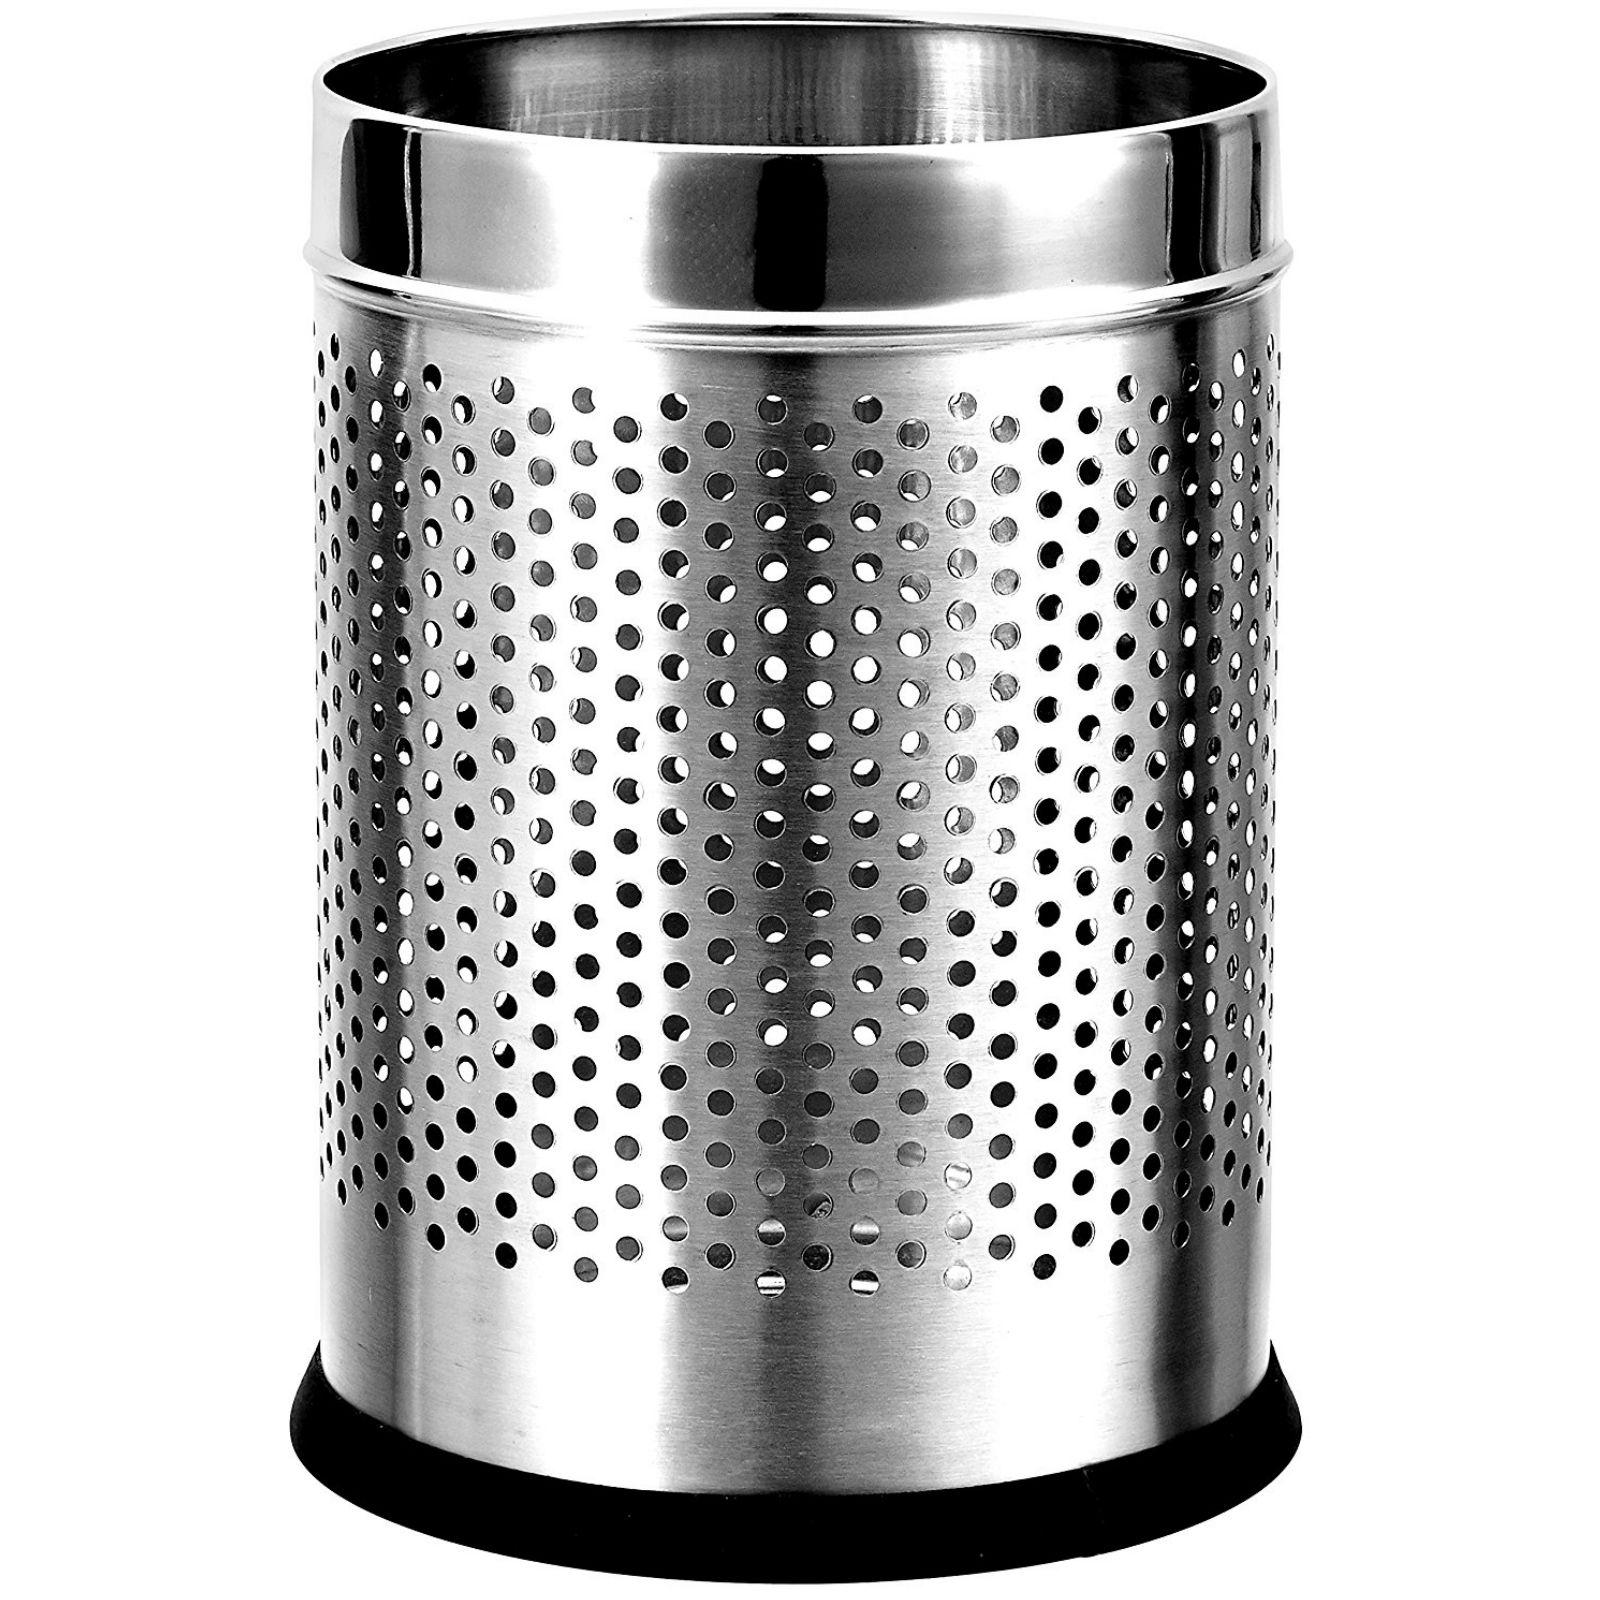 Ss Smoke Dustbin 28 X8 Stationery Items Wholesale